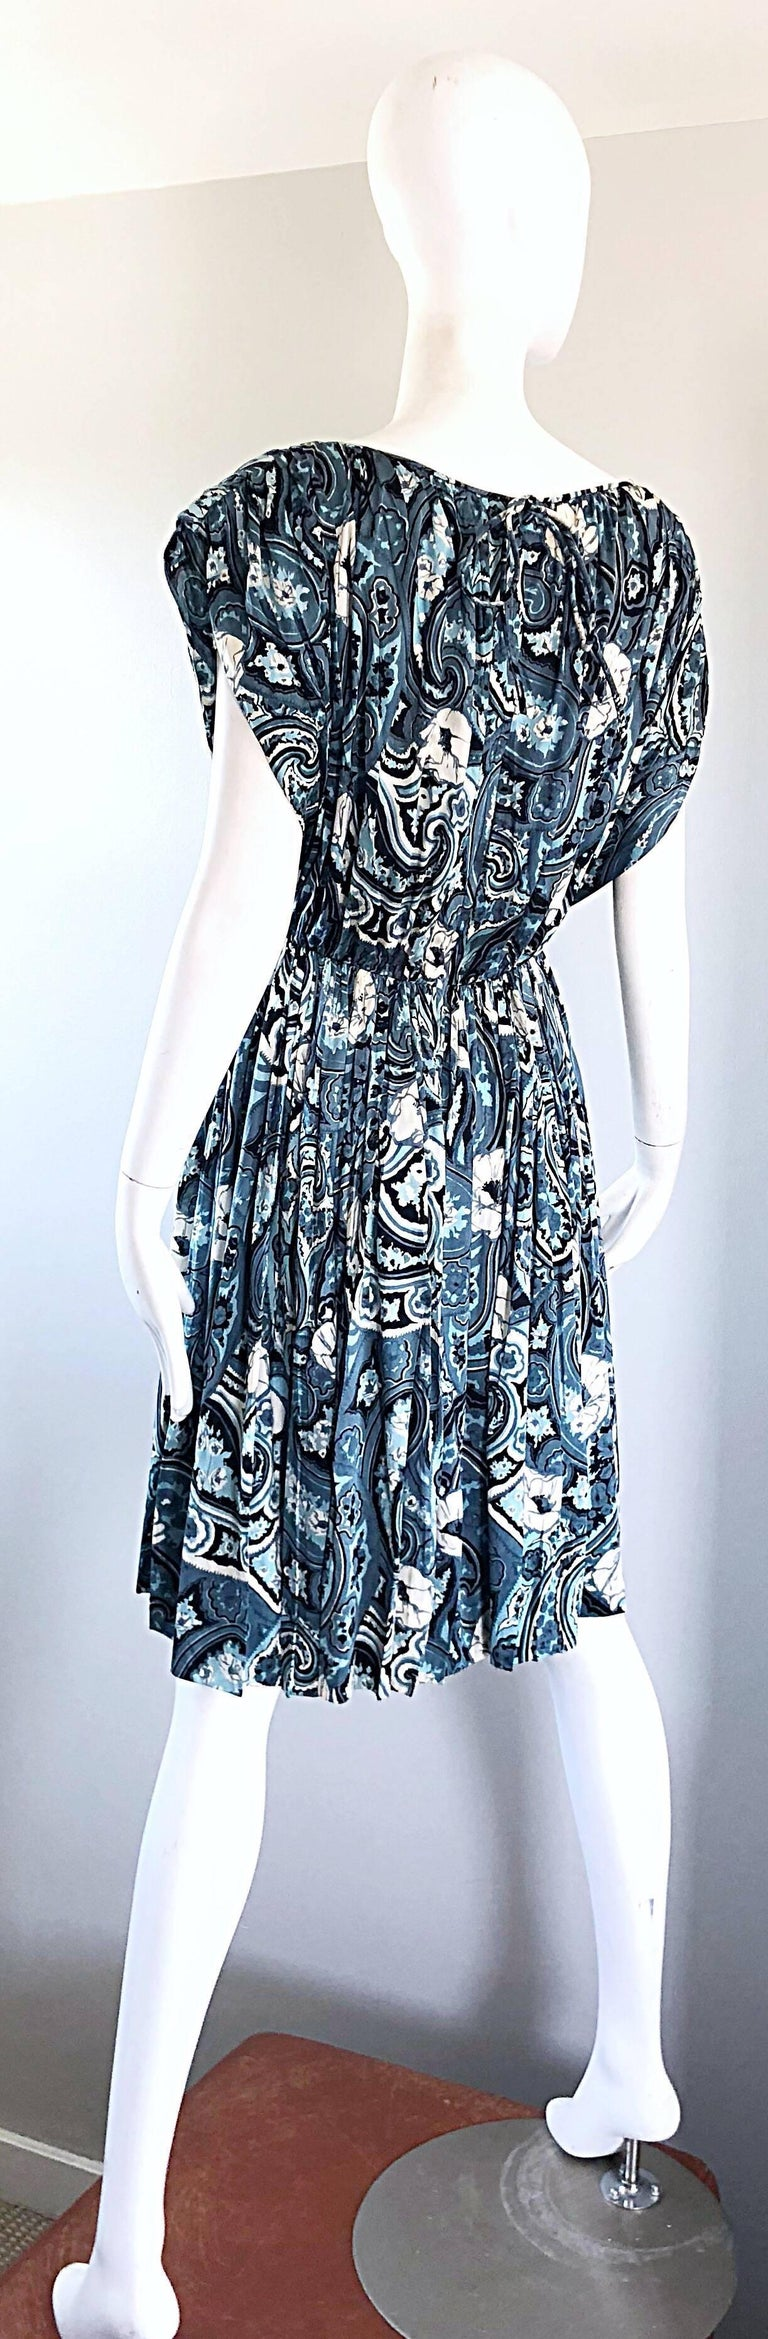 Rare 1950s Townley Blue + White Paisley Flower Print Vintage 50s Dress For Sale 6